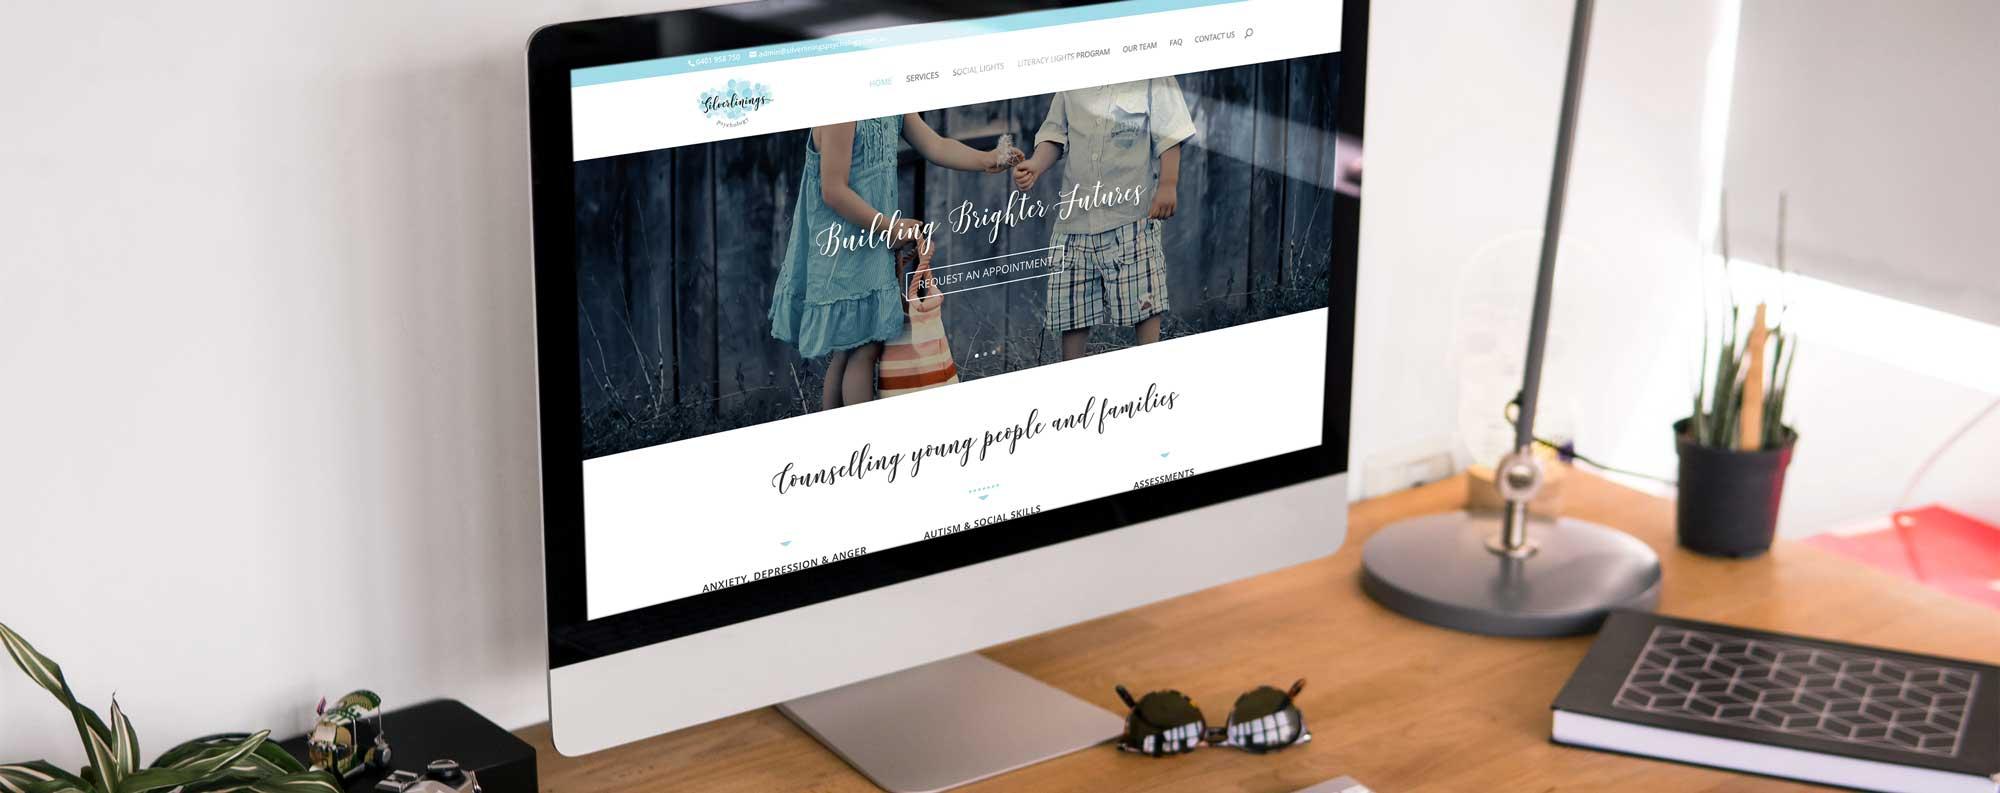 silverlining pscyhologist website design